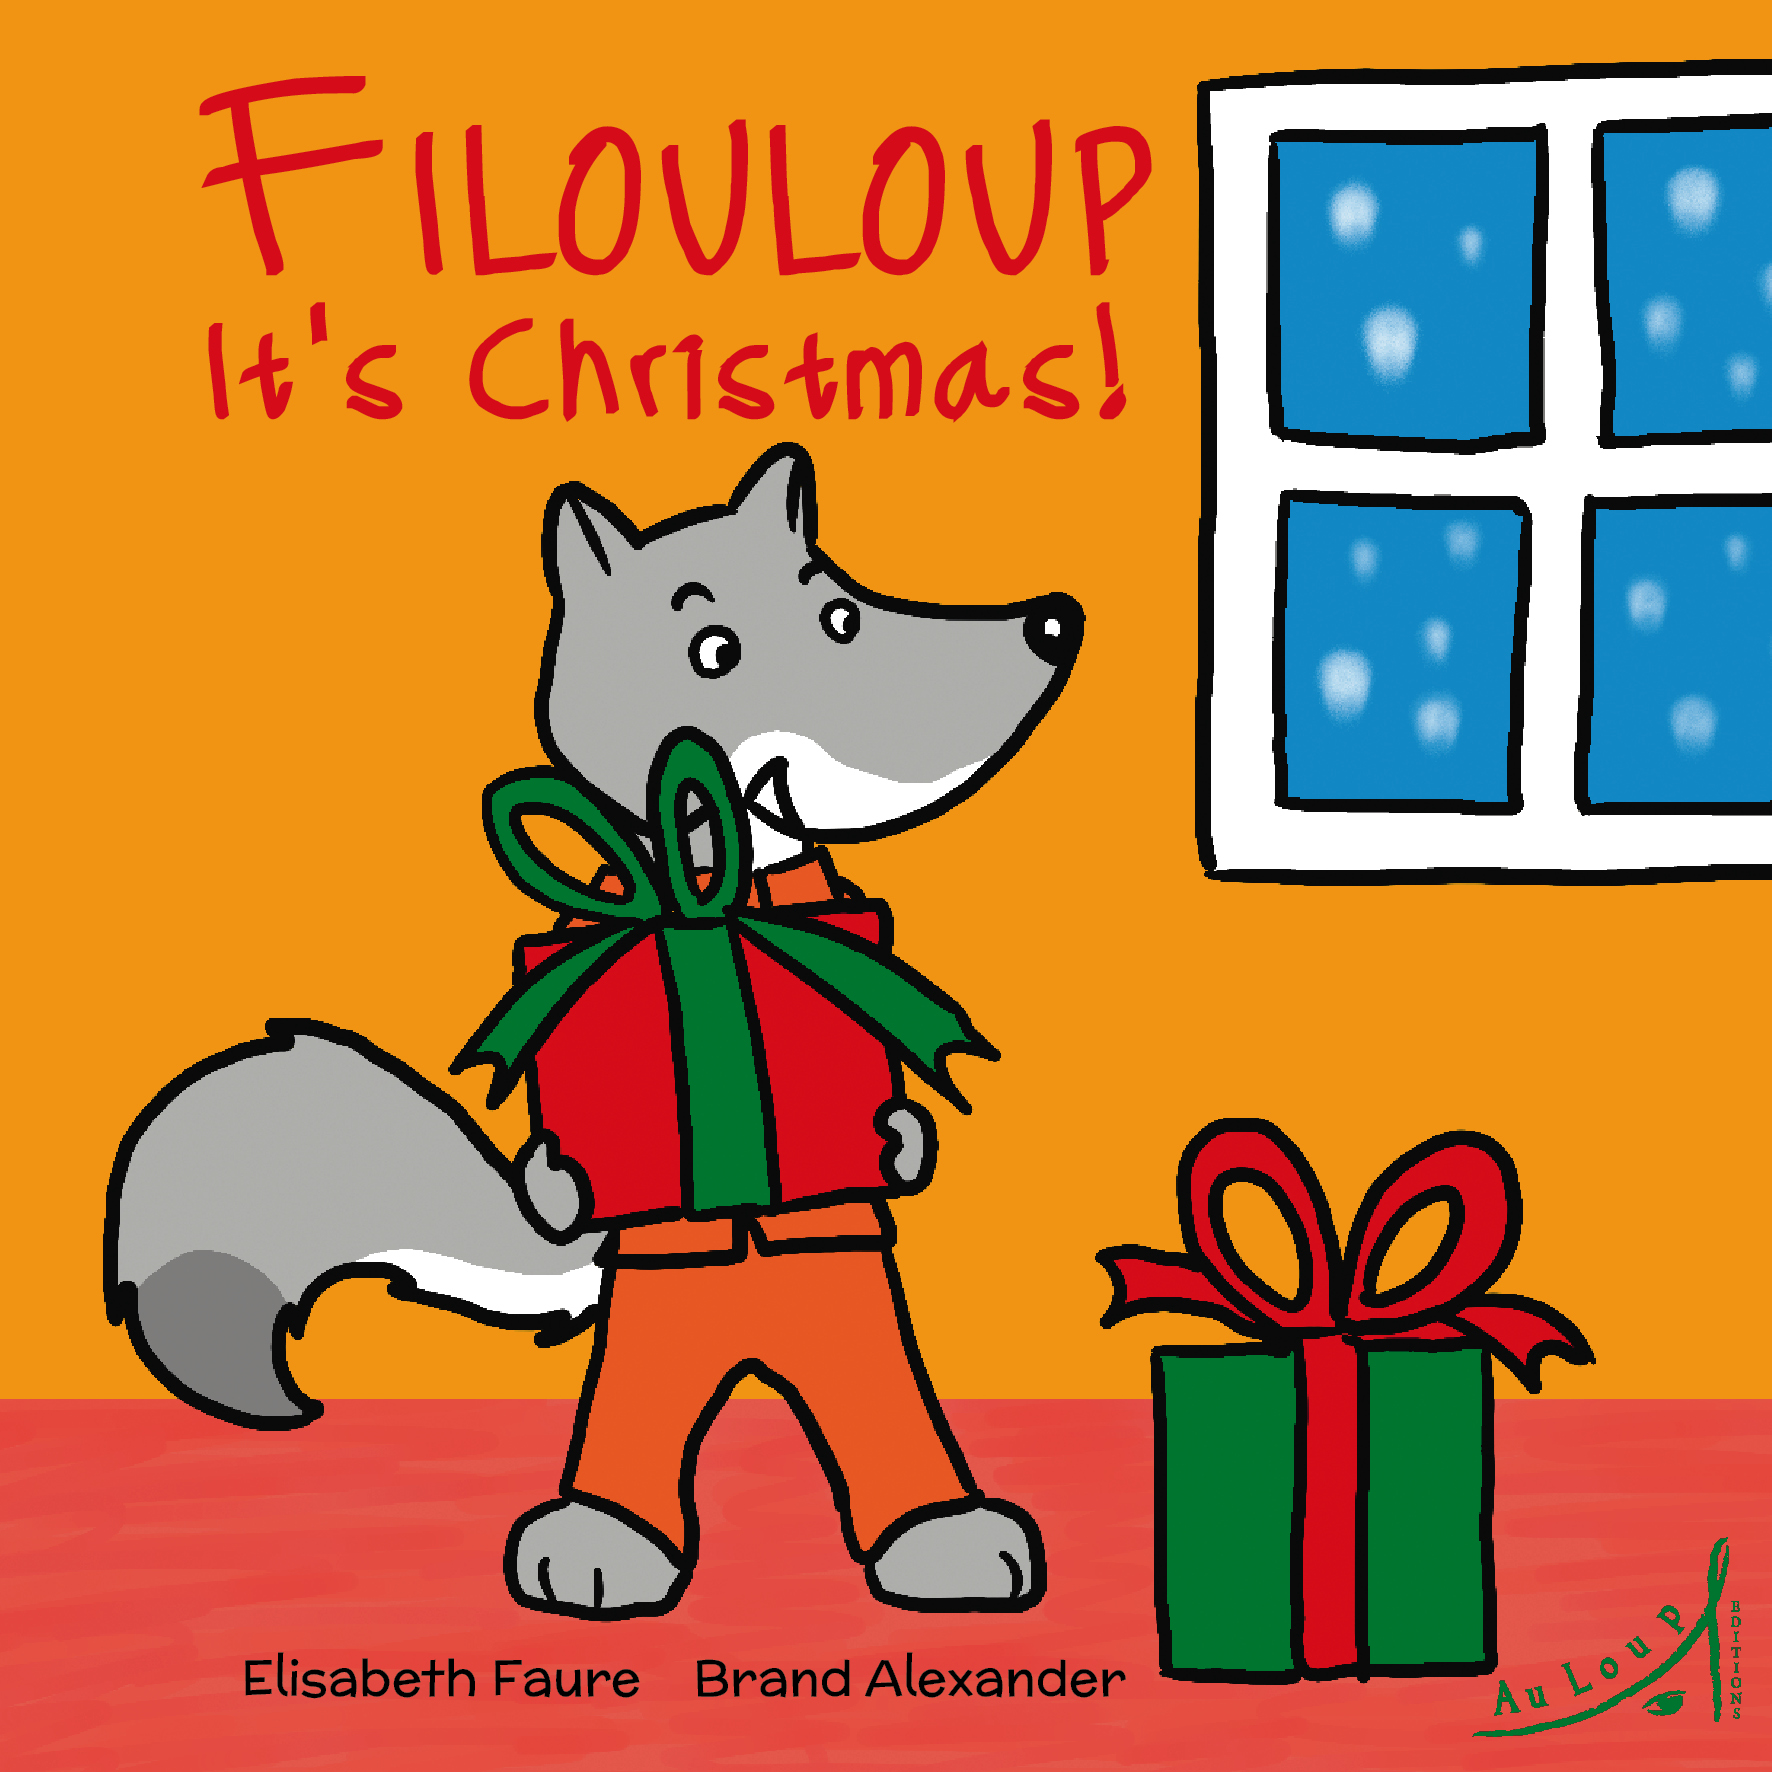 auloup_filouloup2_couv_avant_en